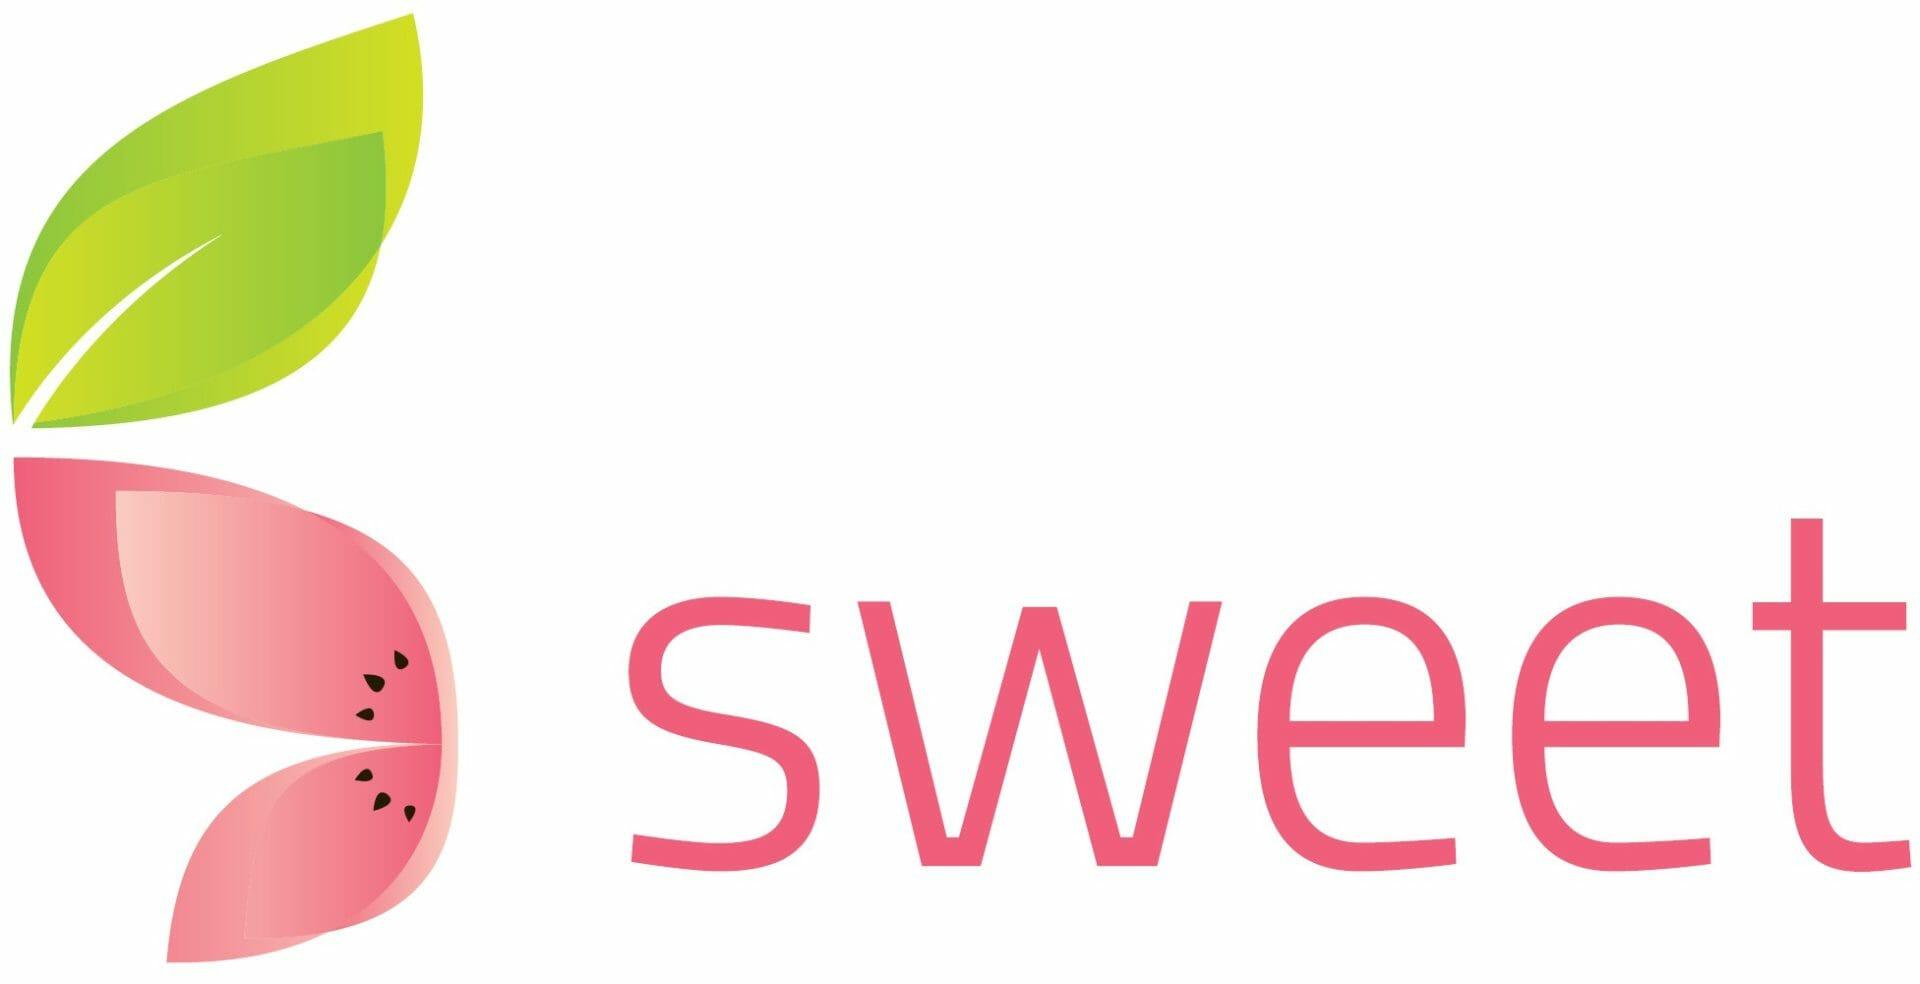 Sweet grafisk profil